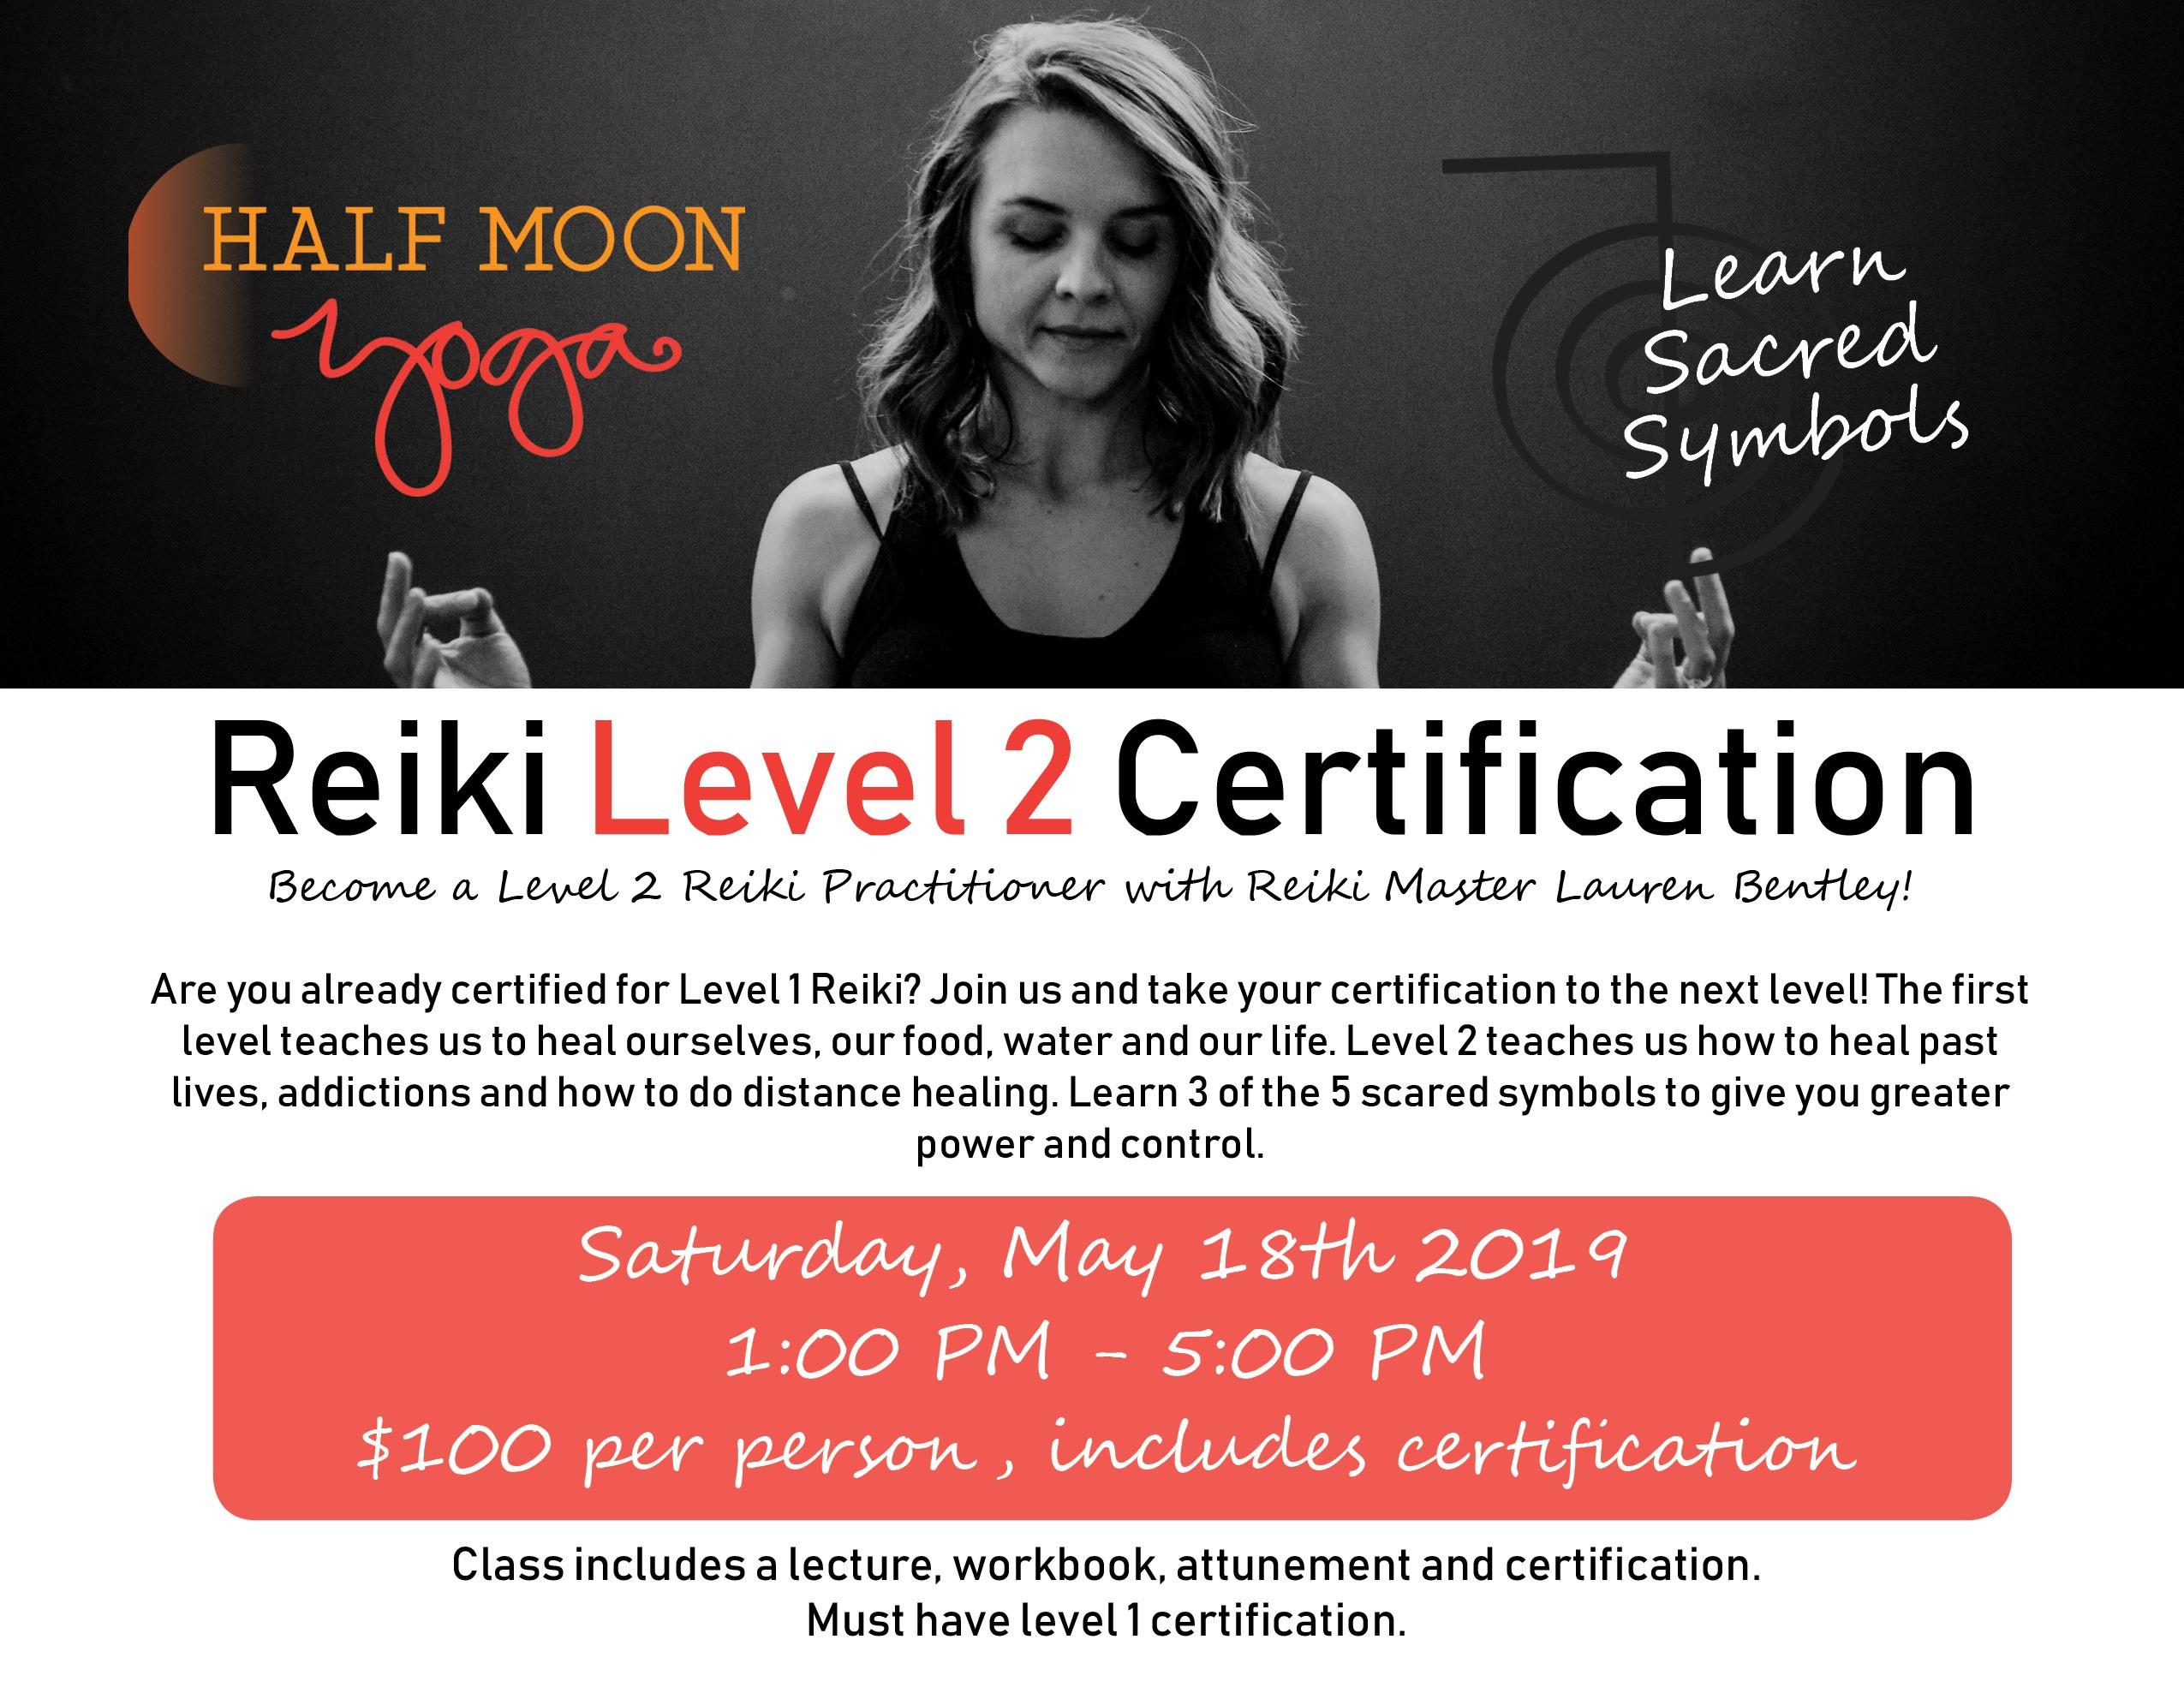 Reiki Level 2 Certification Half Moon Yoga